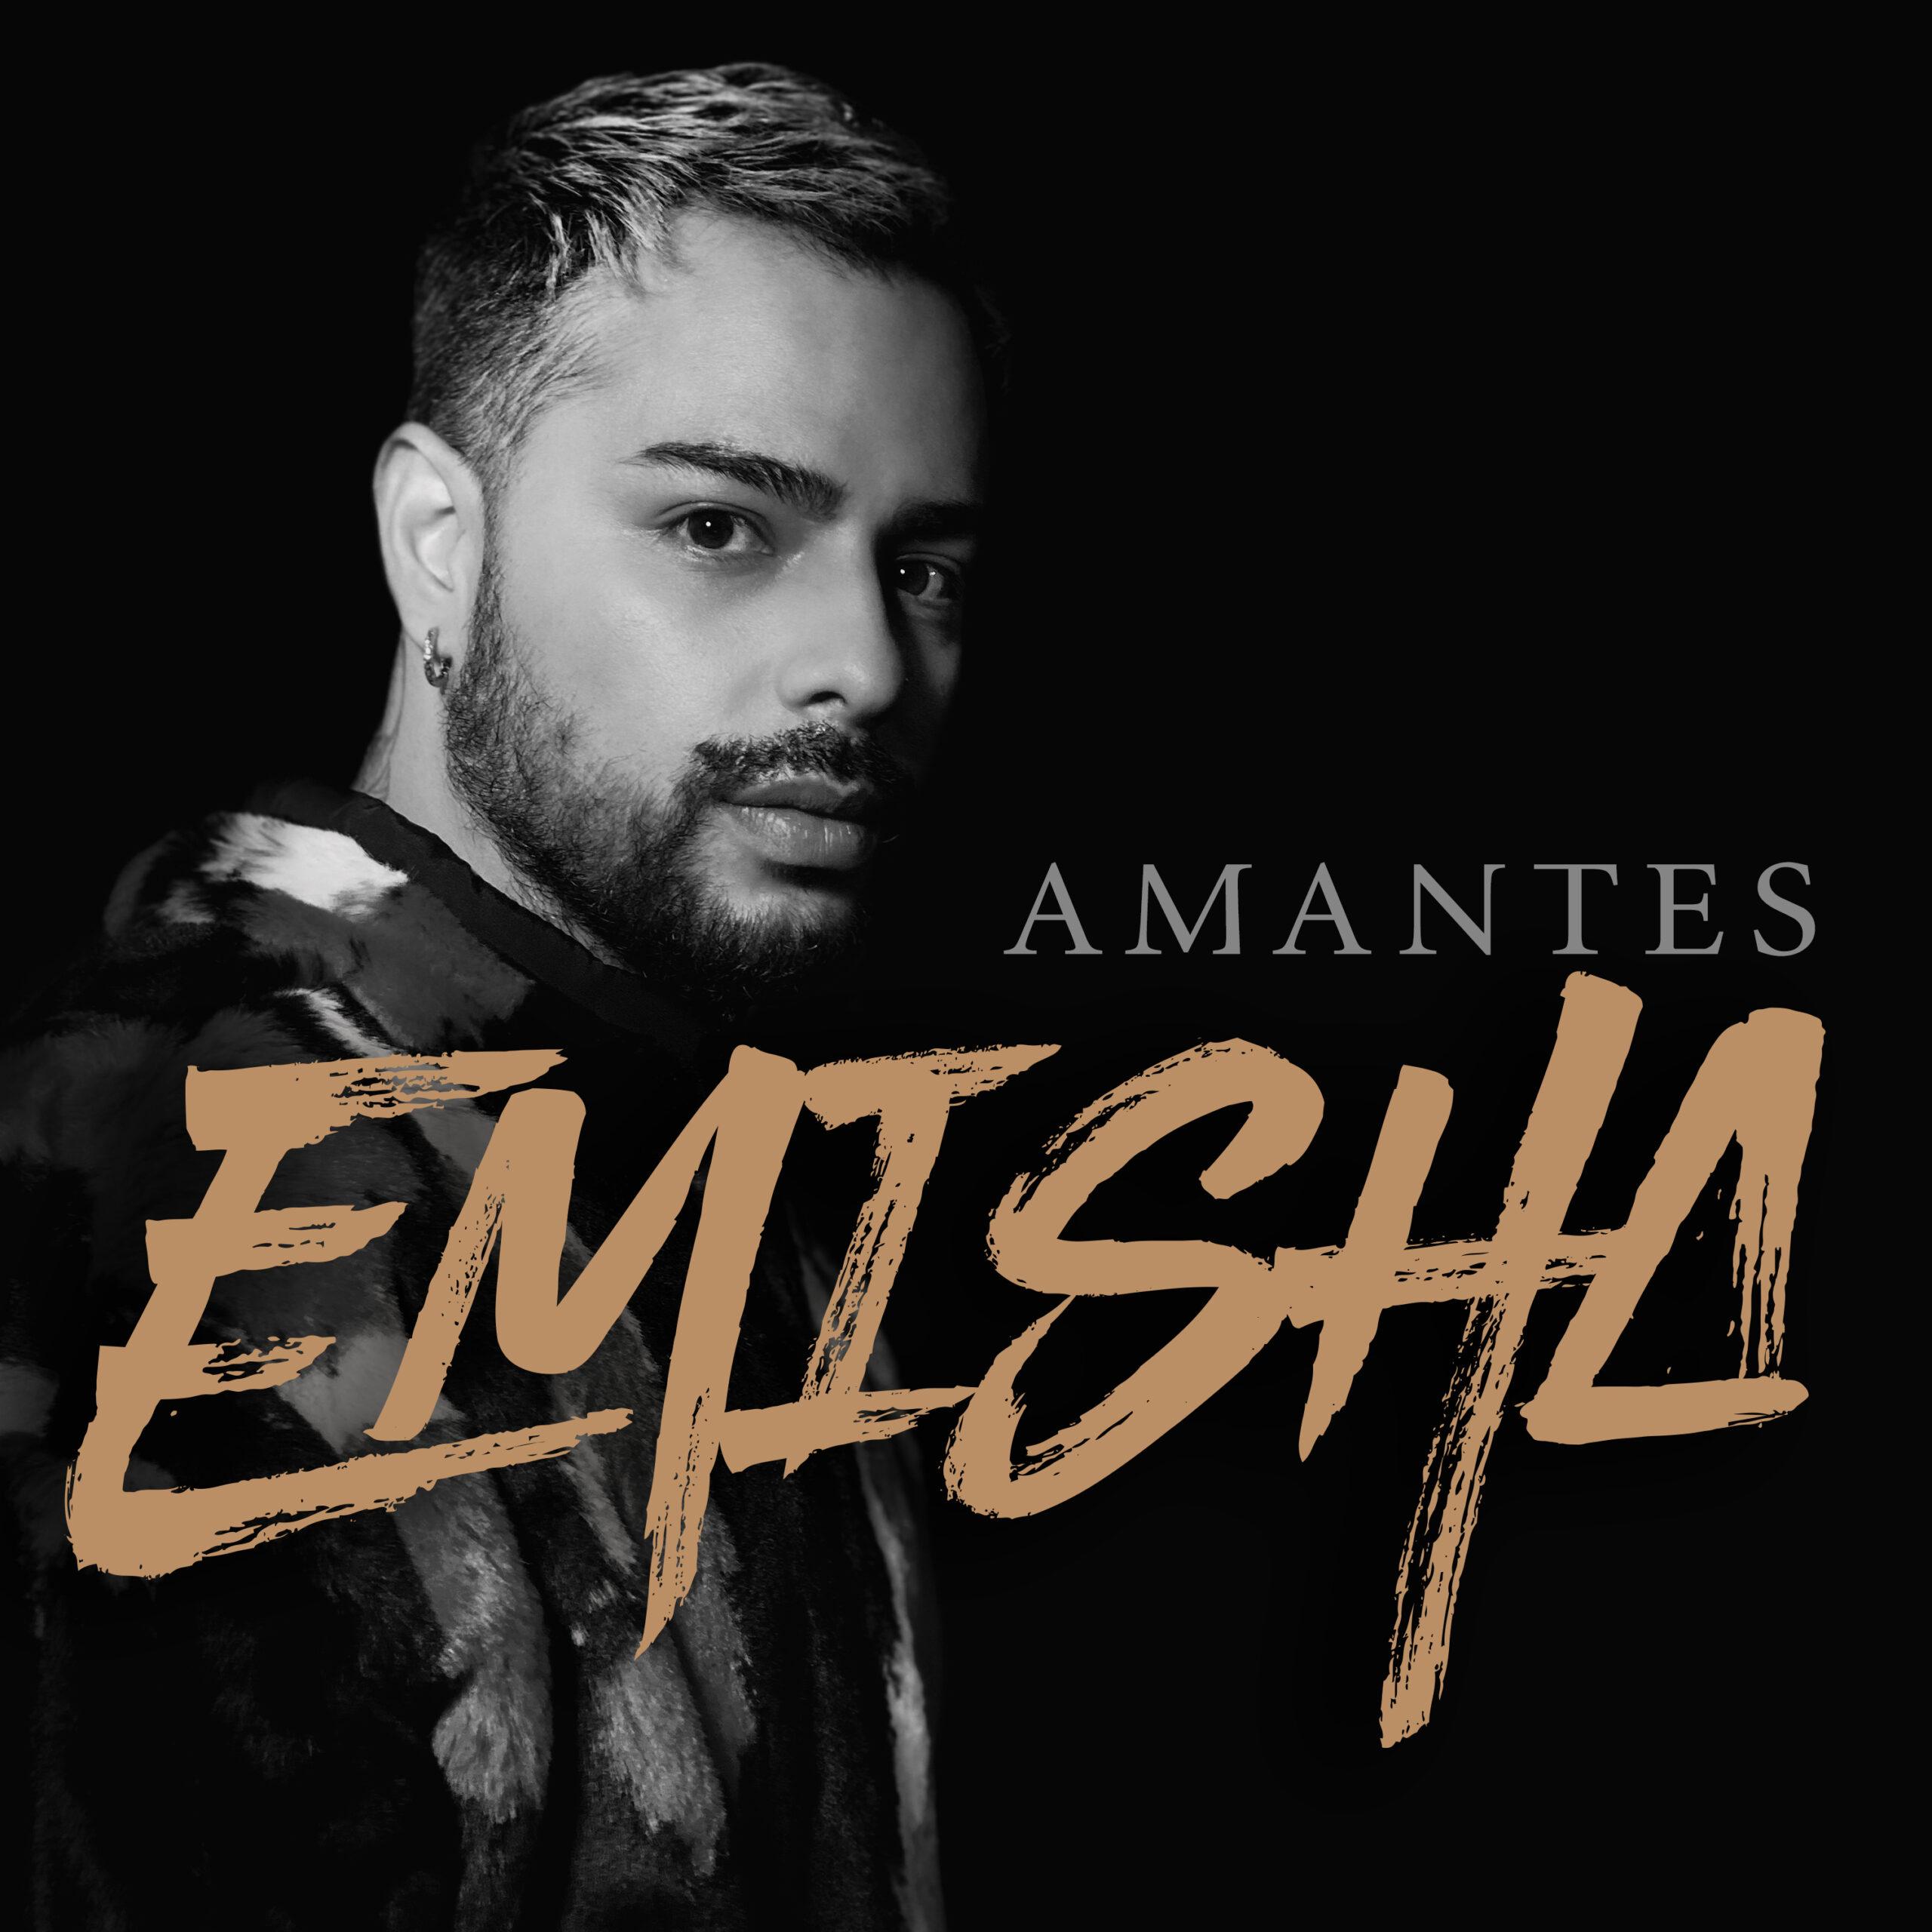 """AMANTES"", su primer sencillo, con URBANA LATIN"